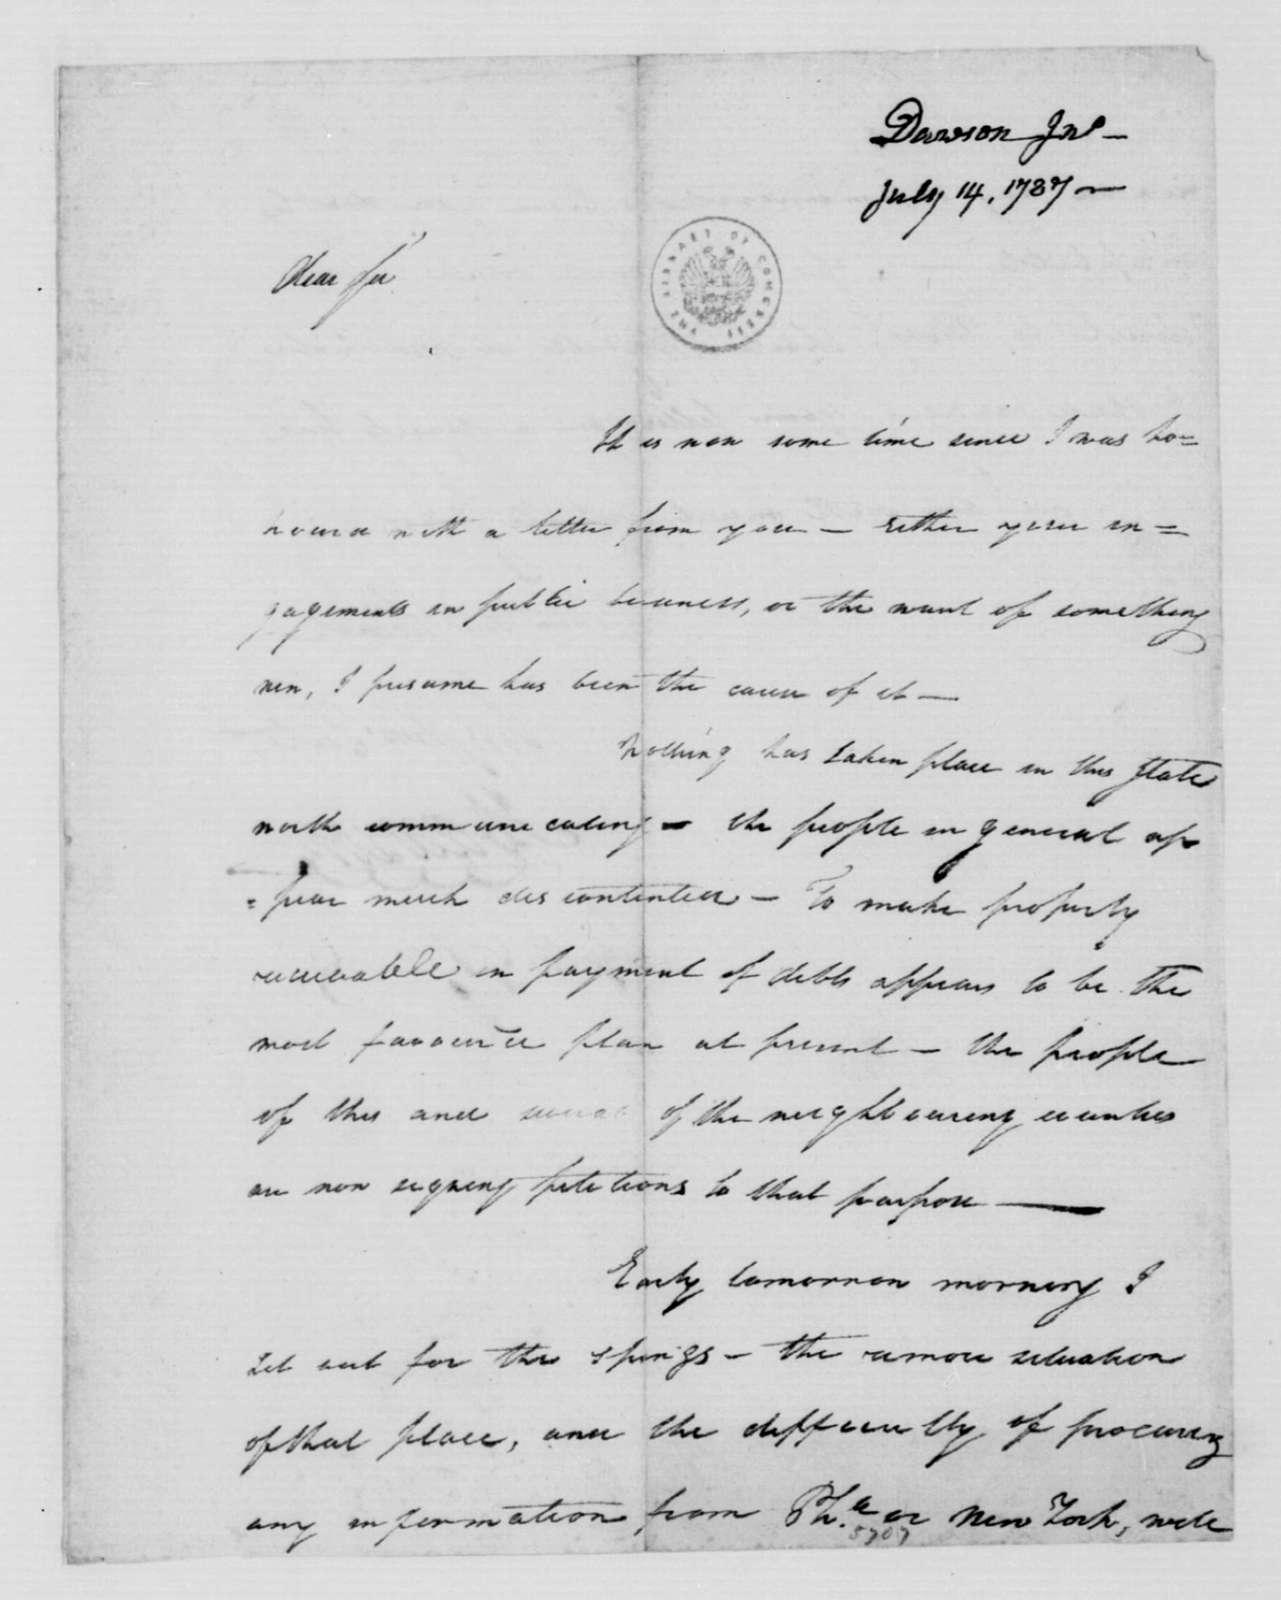 John Dawson to James Madison, July 14, 1787.